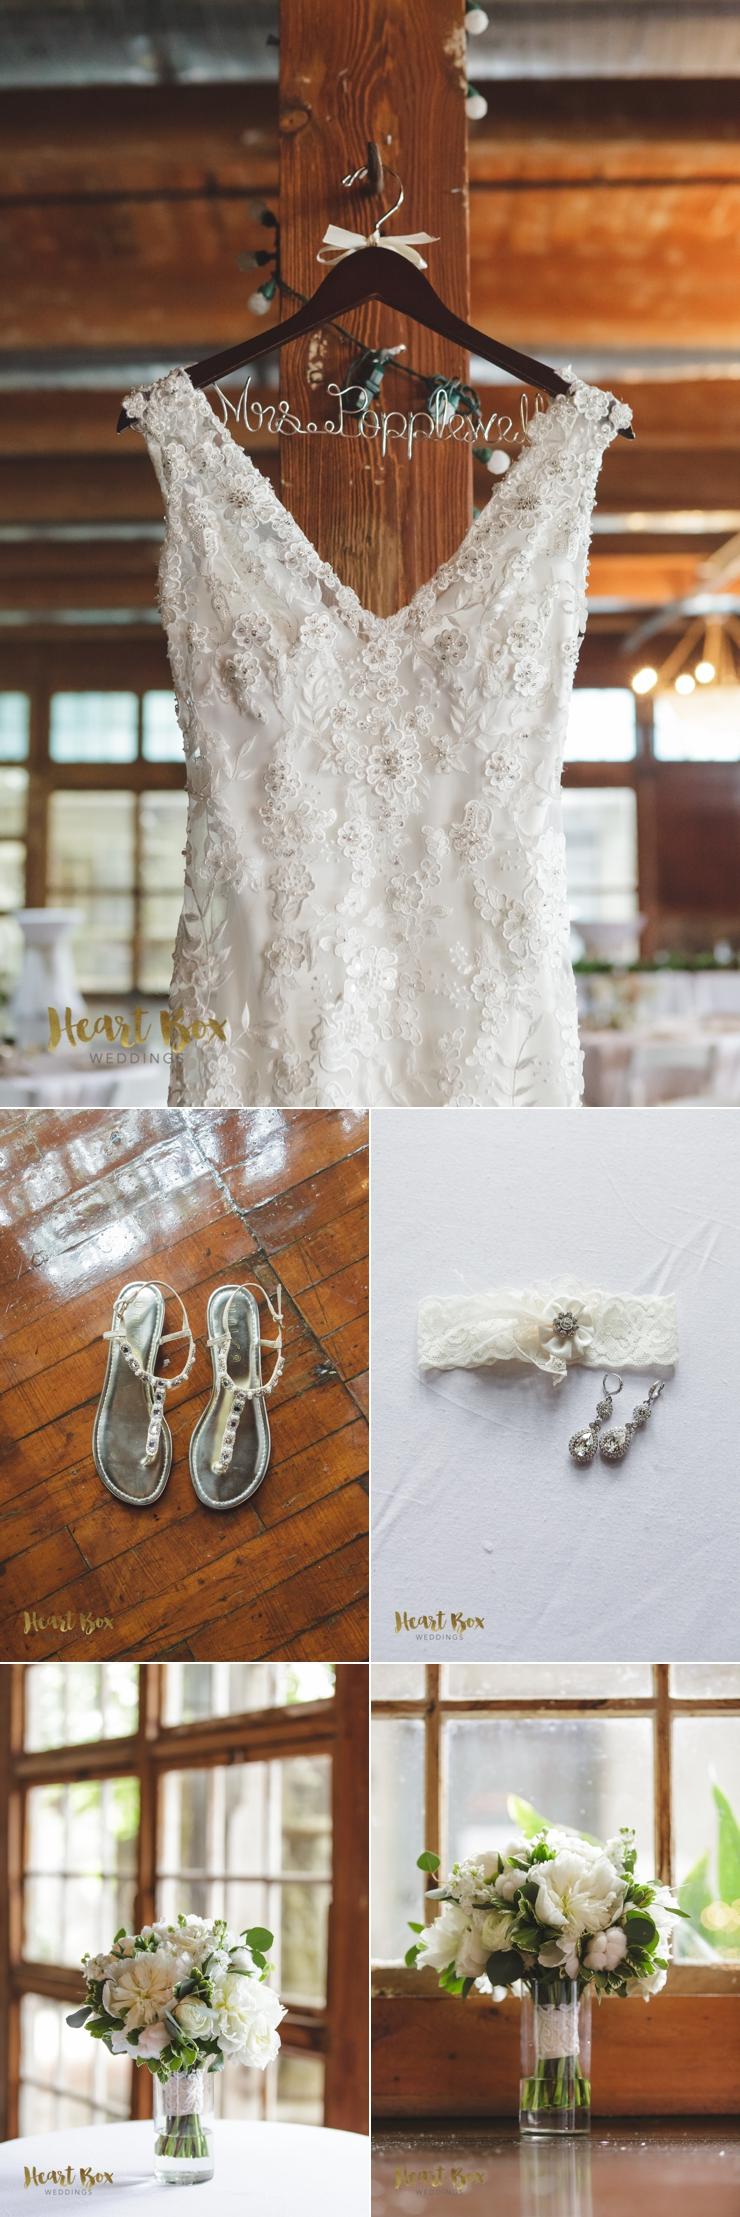 Popplewell Wedding Blog Collages 1.jpg